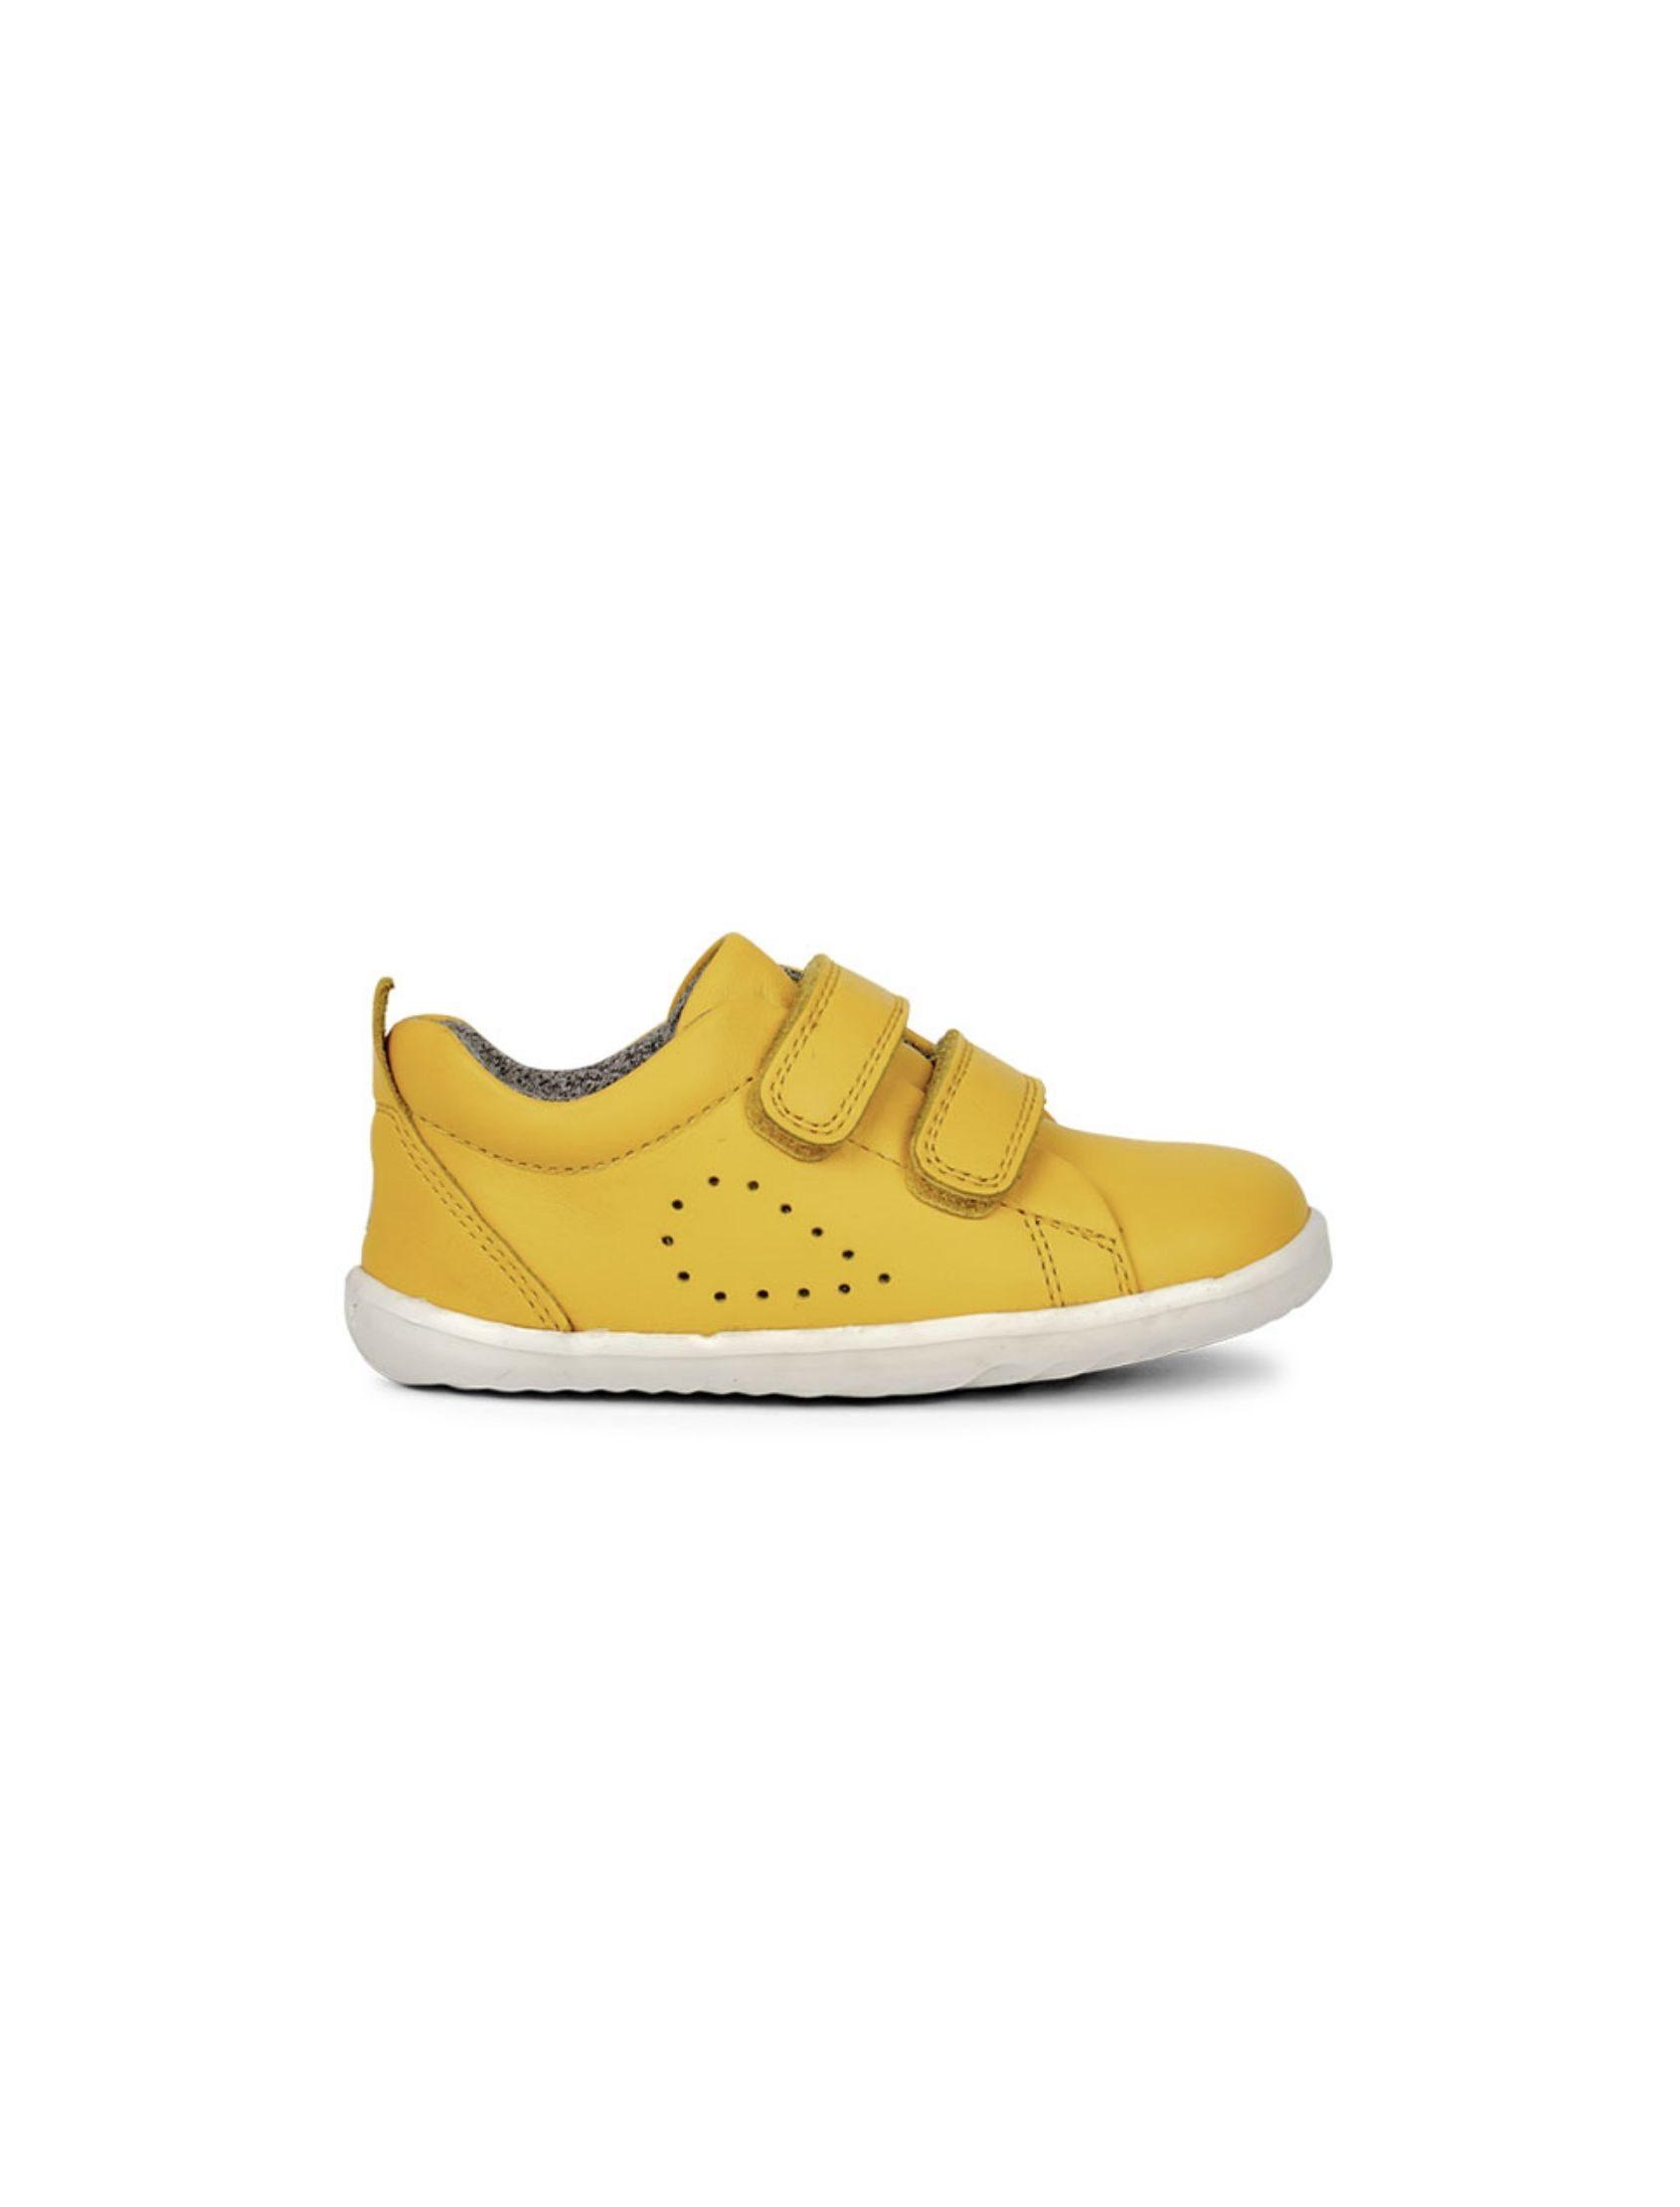 Zapatilla de niño y niña modelo grass court en color amarillo con cierre d evelcro